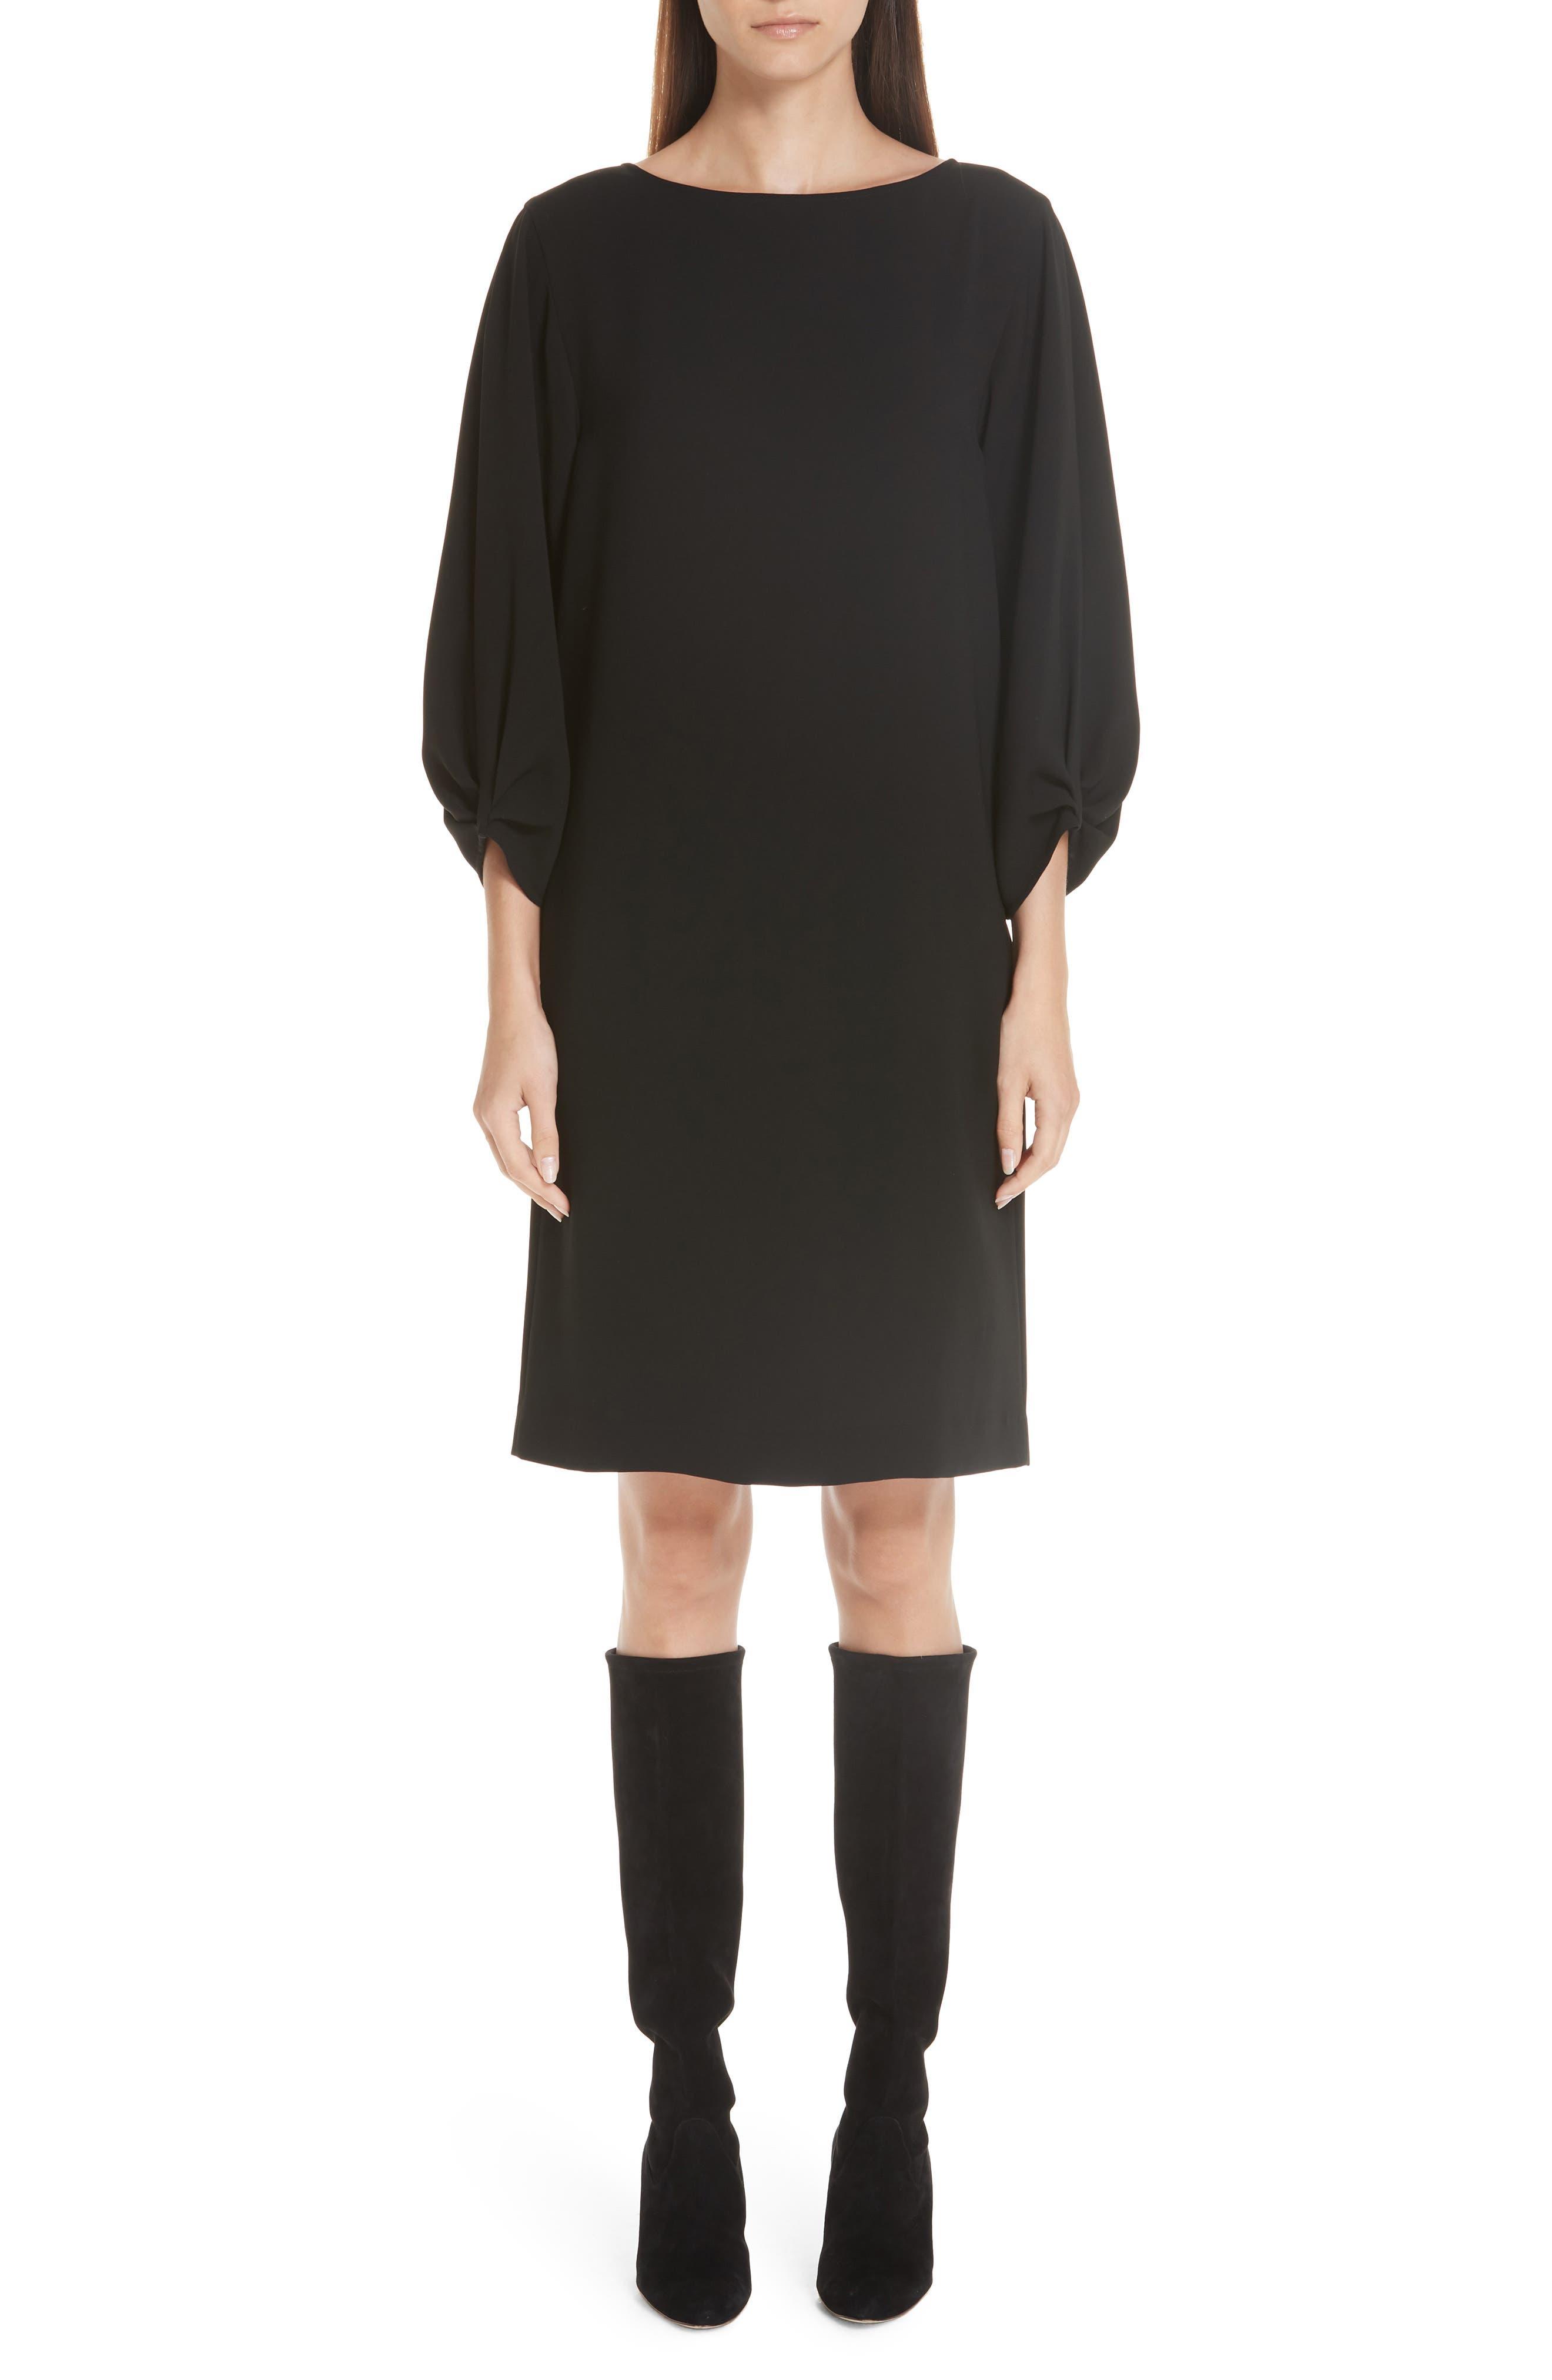 Image of Lafayette 148 New York Wynona Finesse Crepe Dress